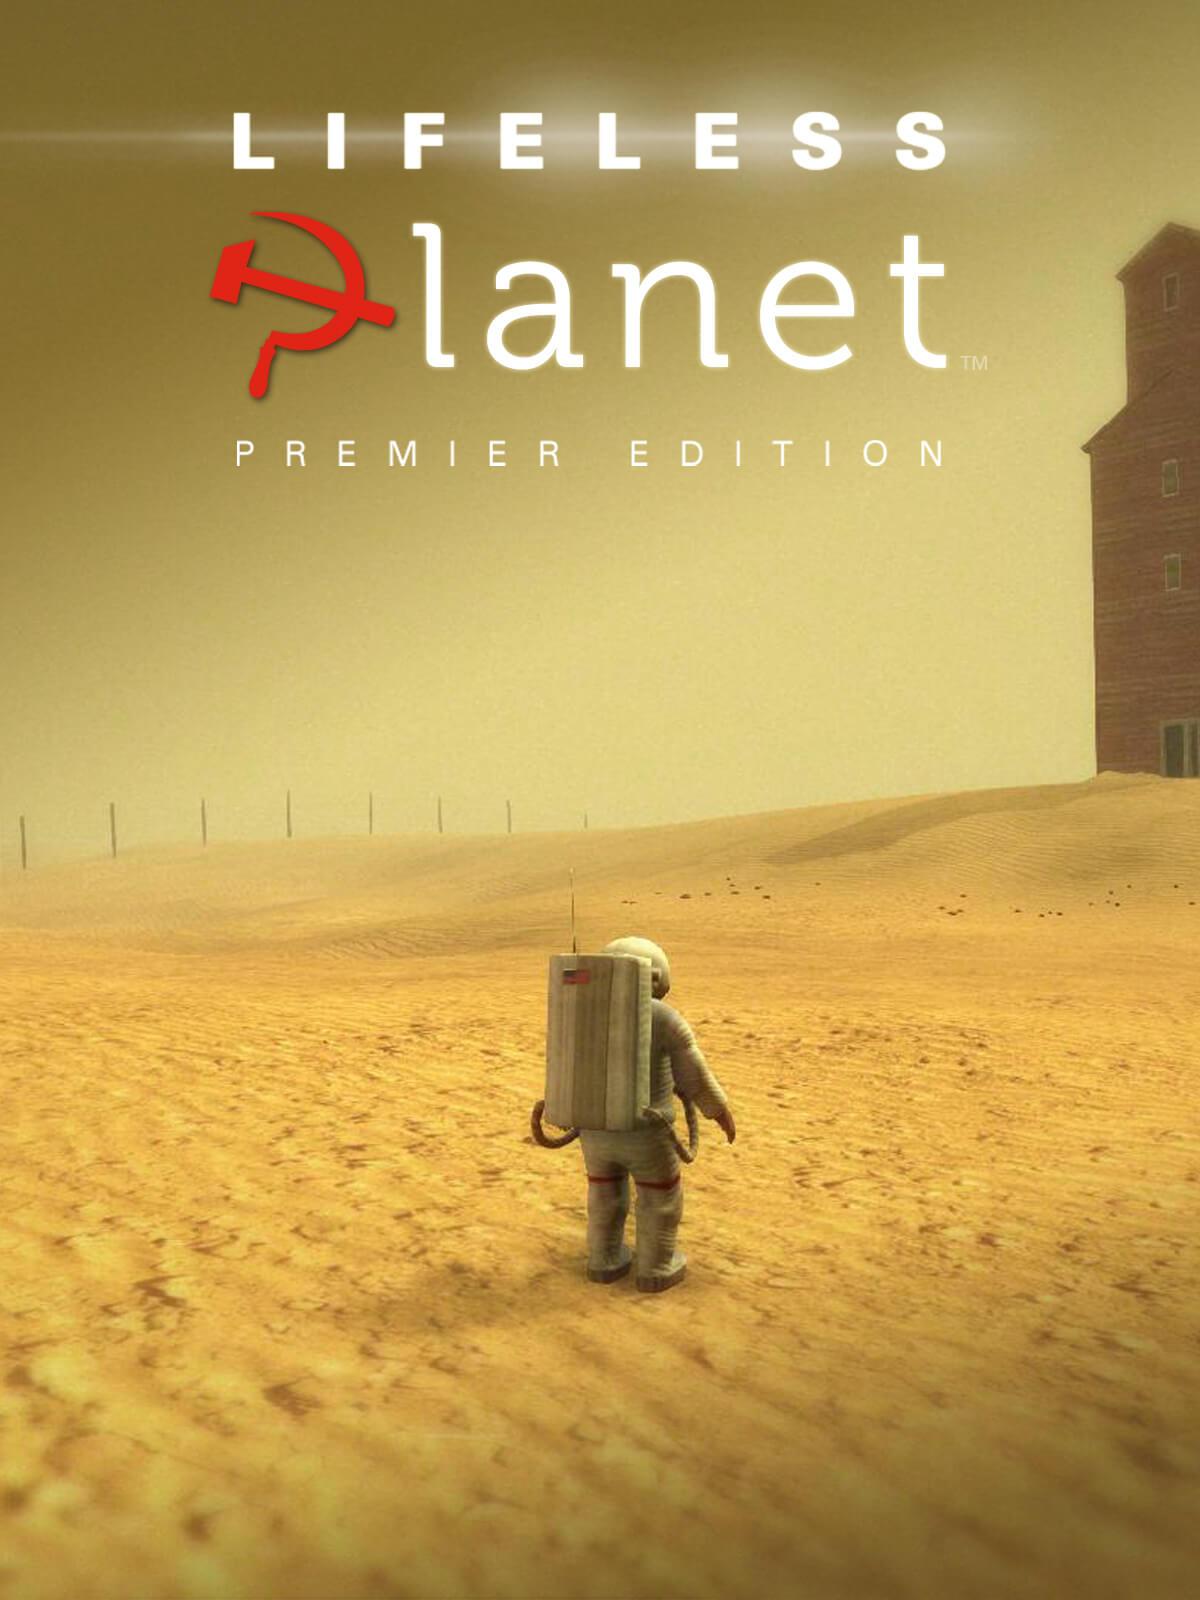 Lifeless Planet PREMIER EDITION (PC) gratis im Epic Store